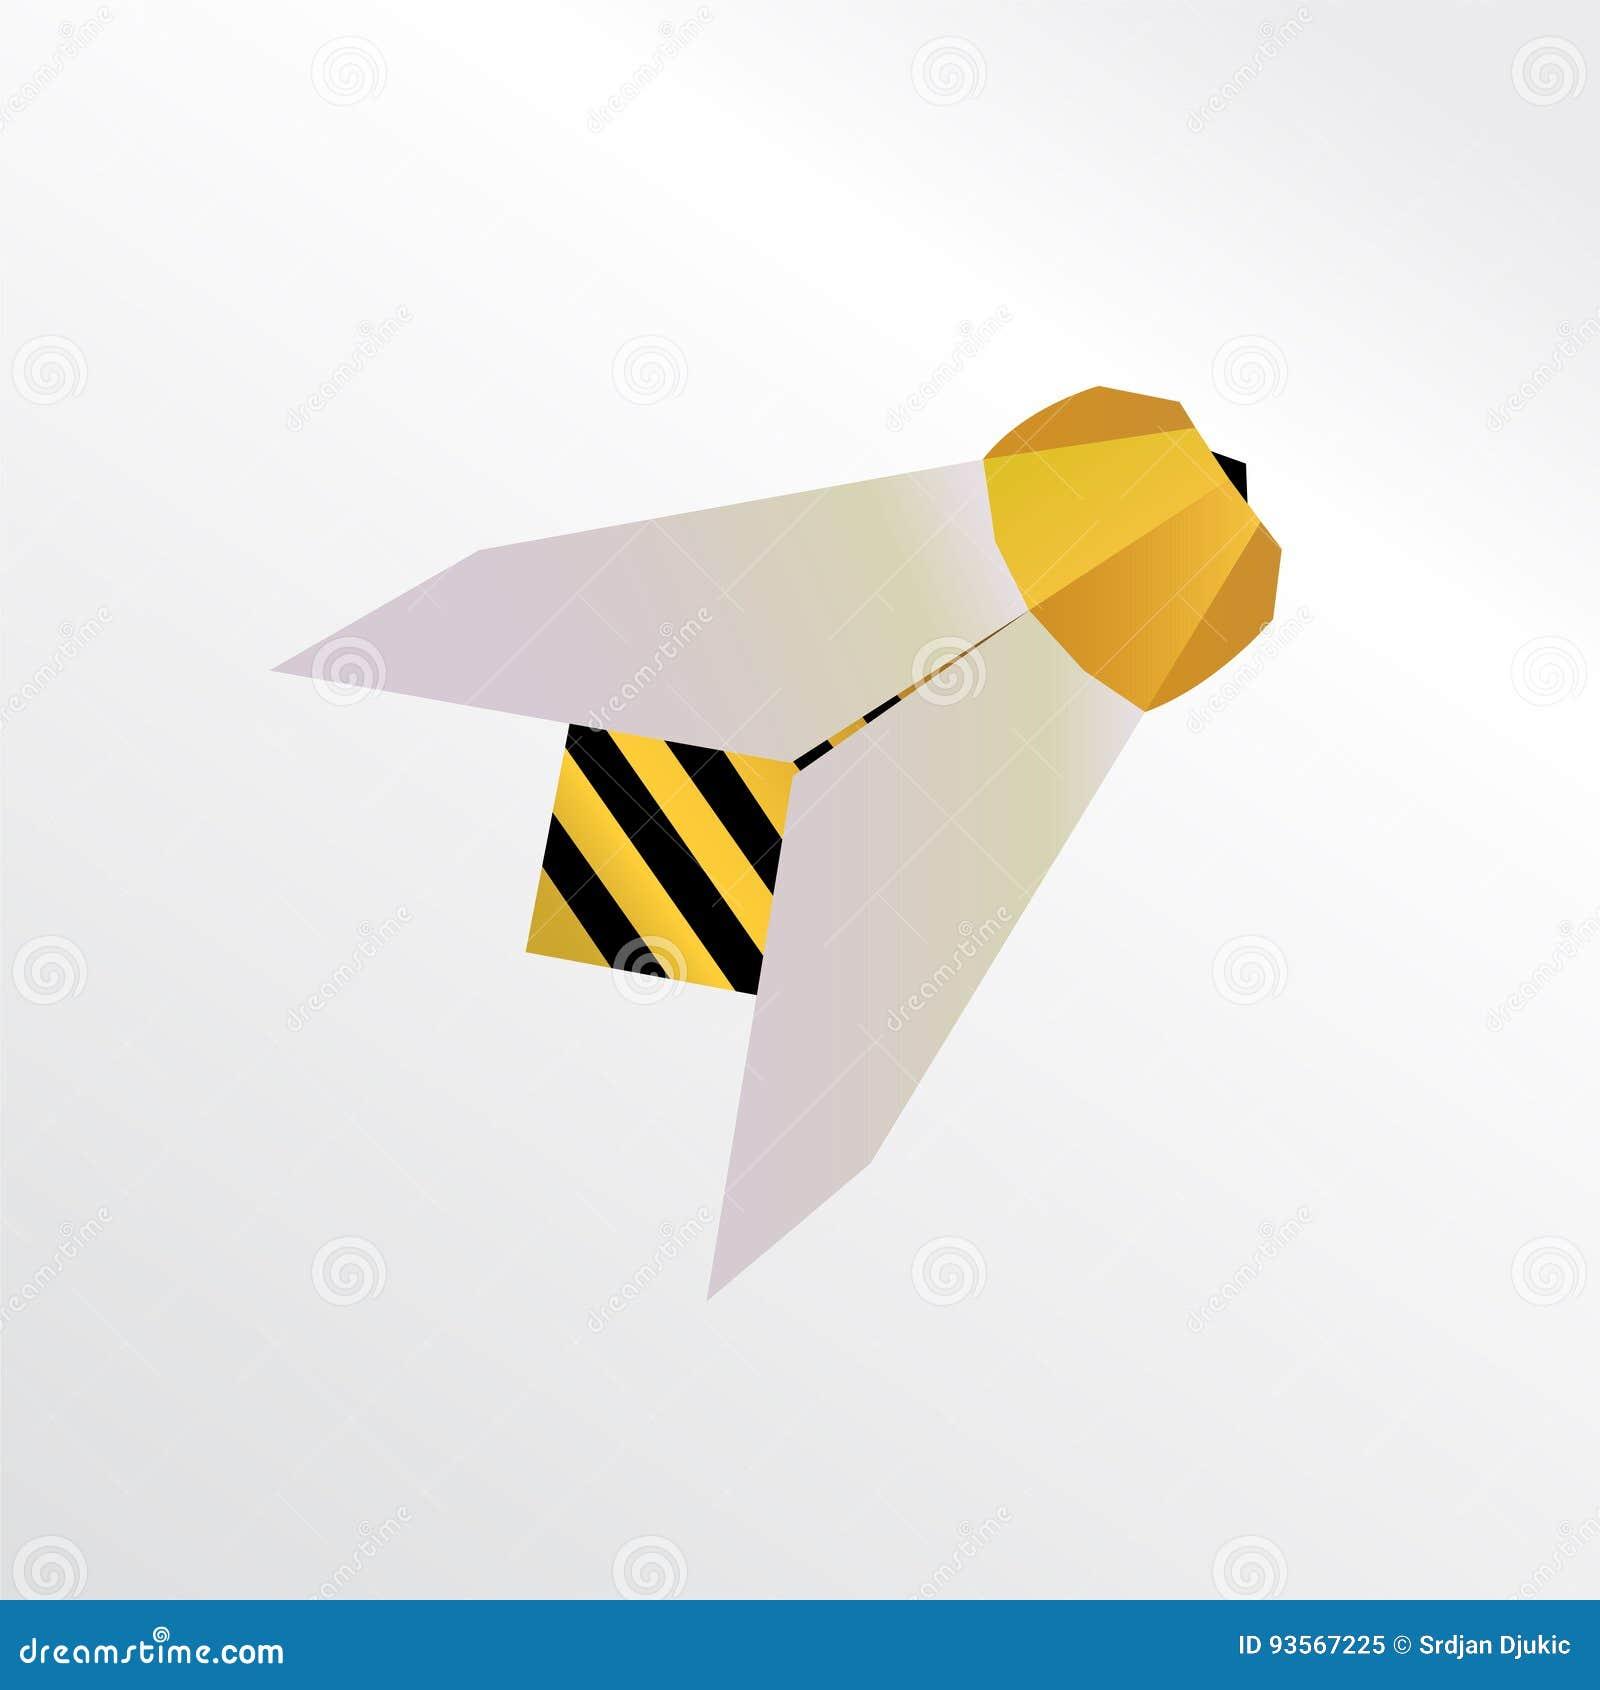 Origami Biene Stock Abbildung Illustration Von Fahne 93567225